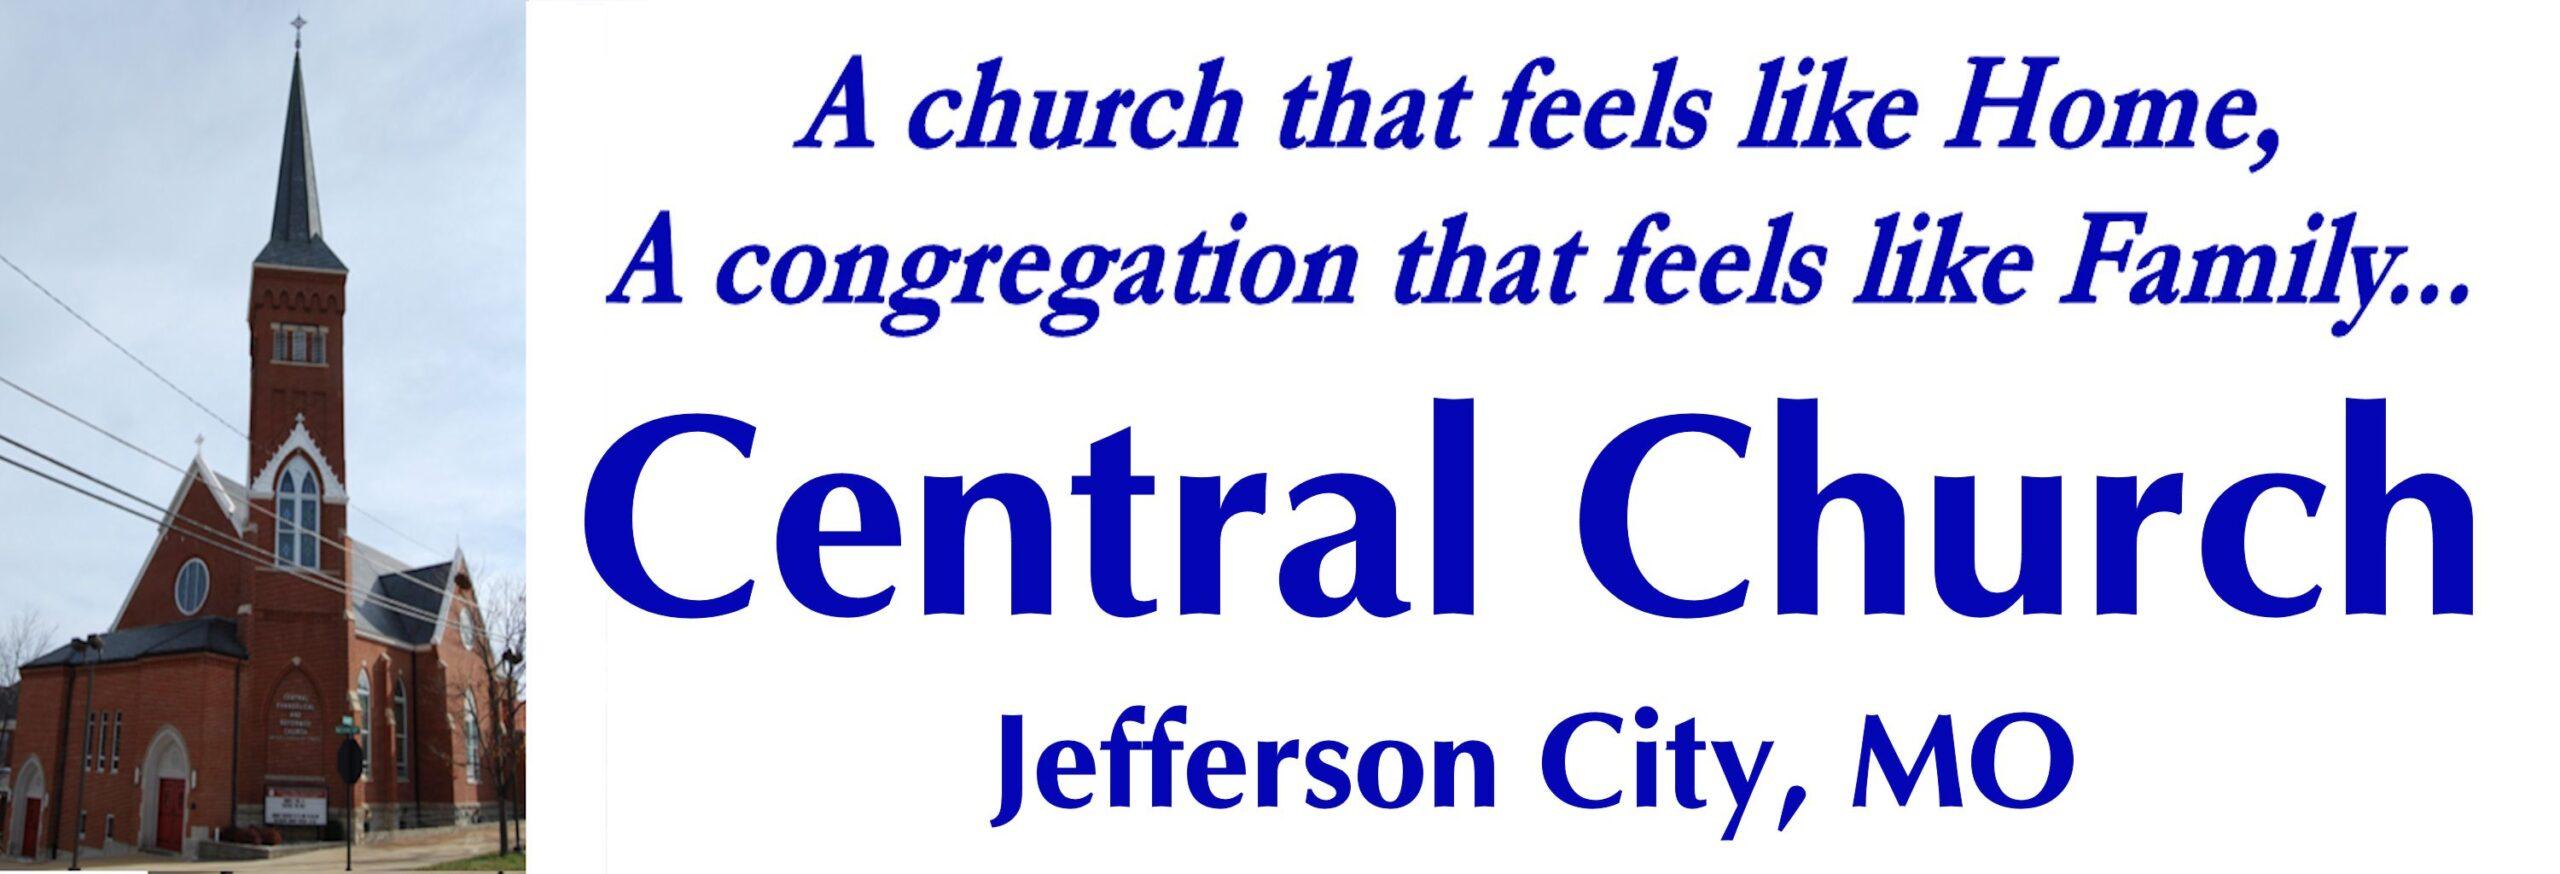 Central Church - Jefferson City, MO